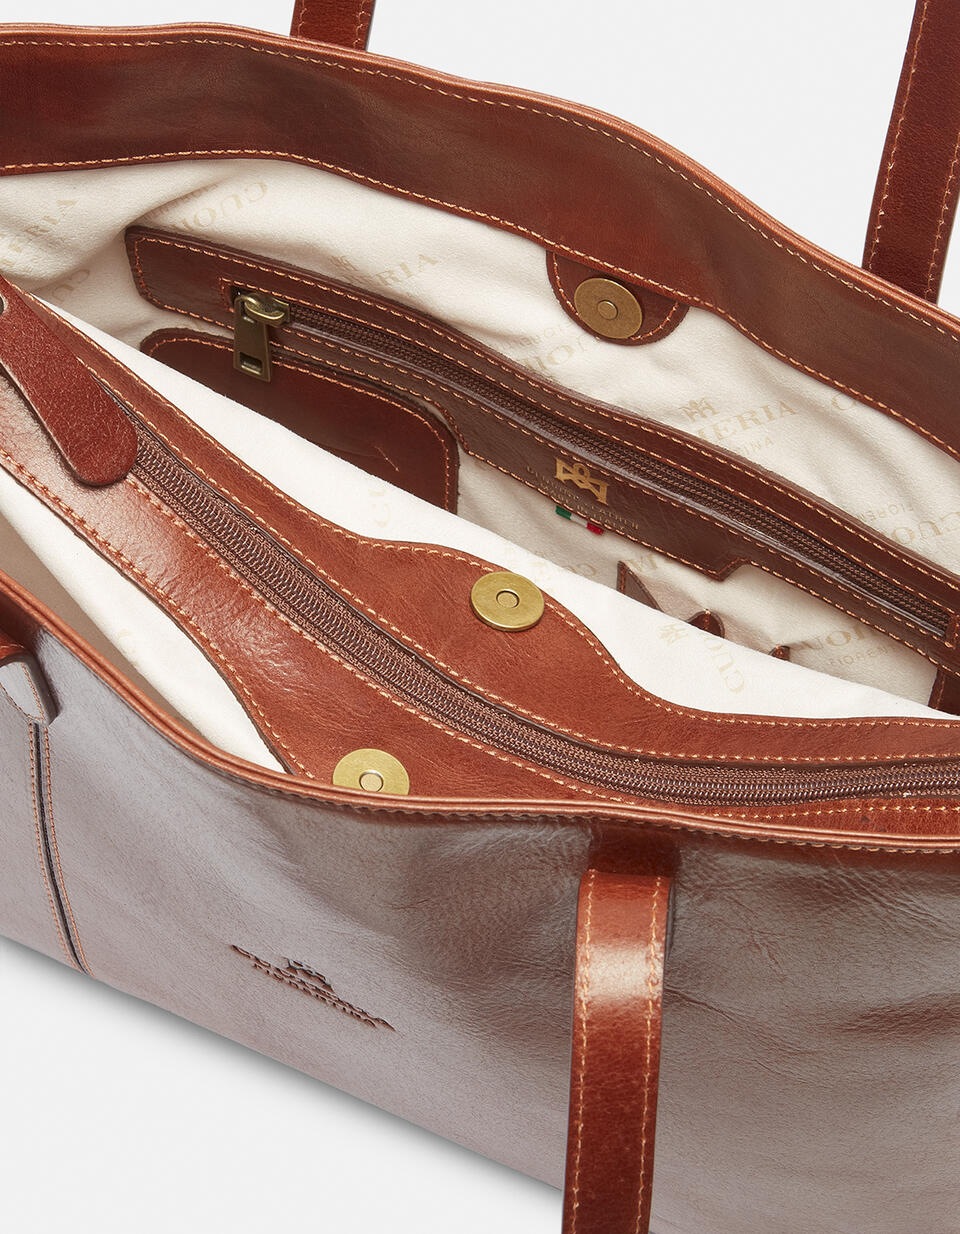 Warm and Colour large leather shopping bag  Cuoieria Fiorentina